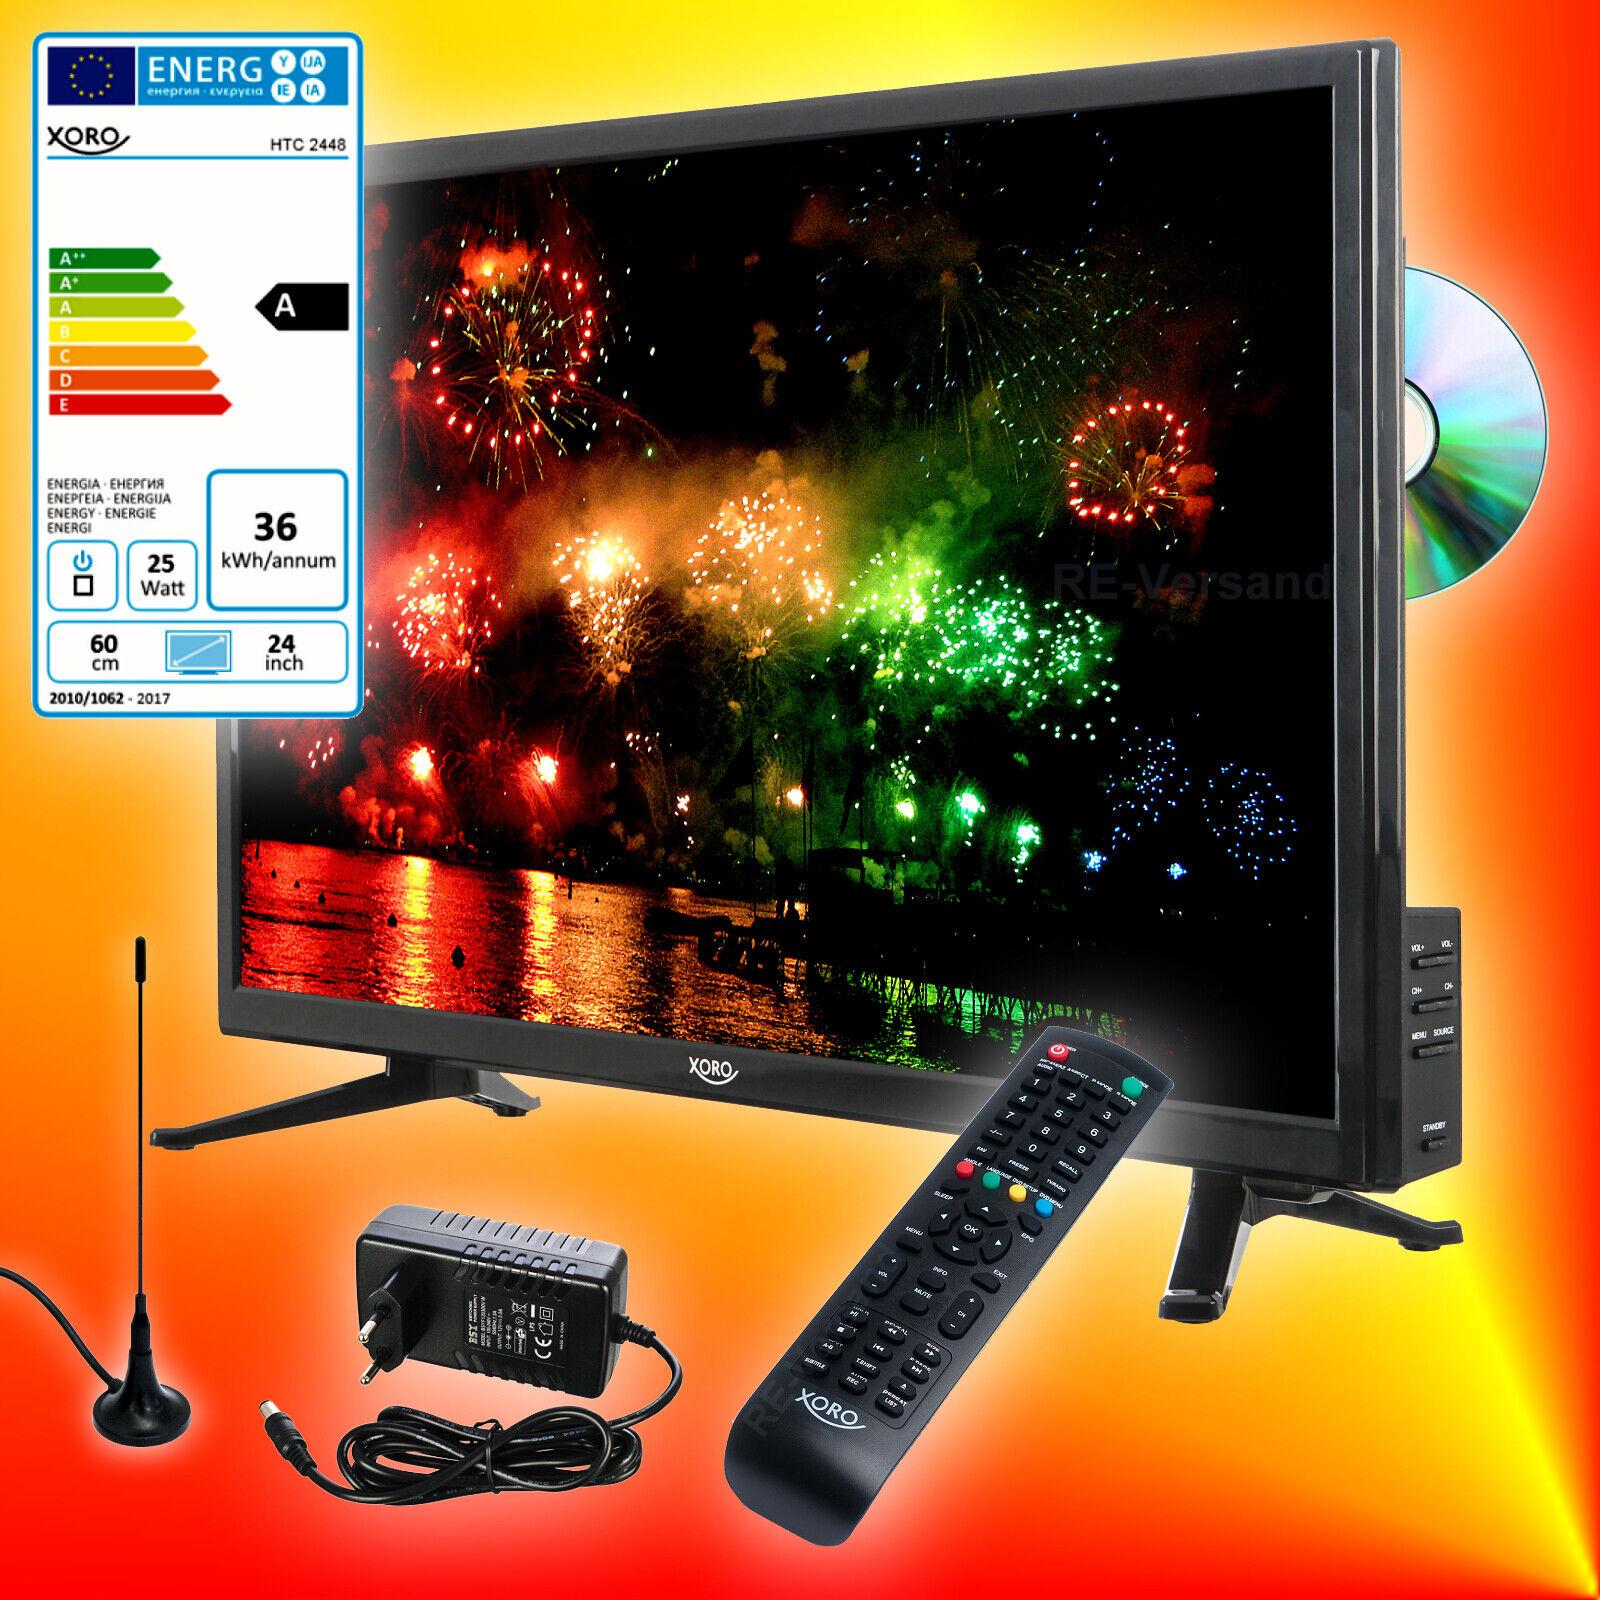 Xoro HTC 2448 60cm TV DVD-Player DVB-T2/S2/C Fernseher CI USB-Aufnahme EEK A